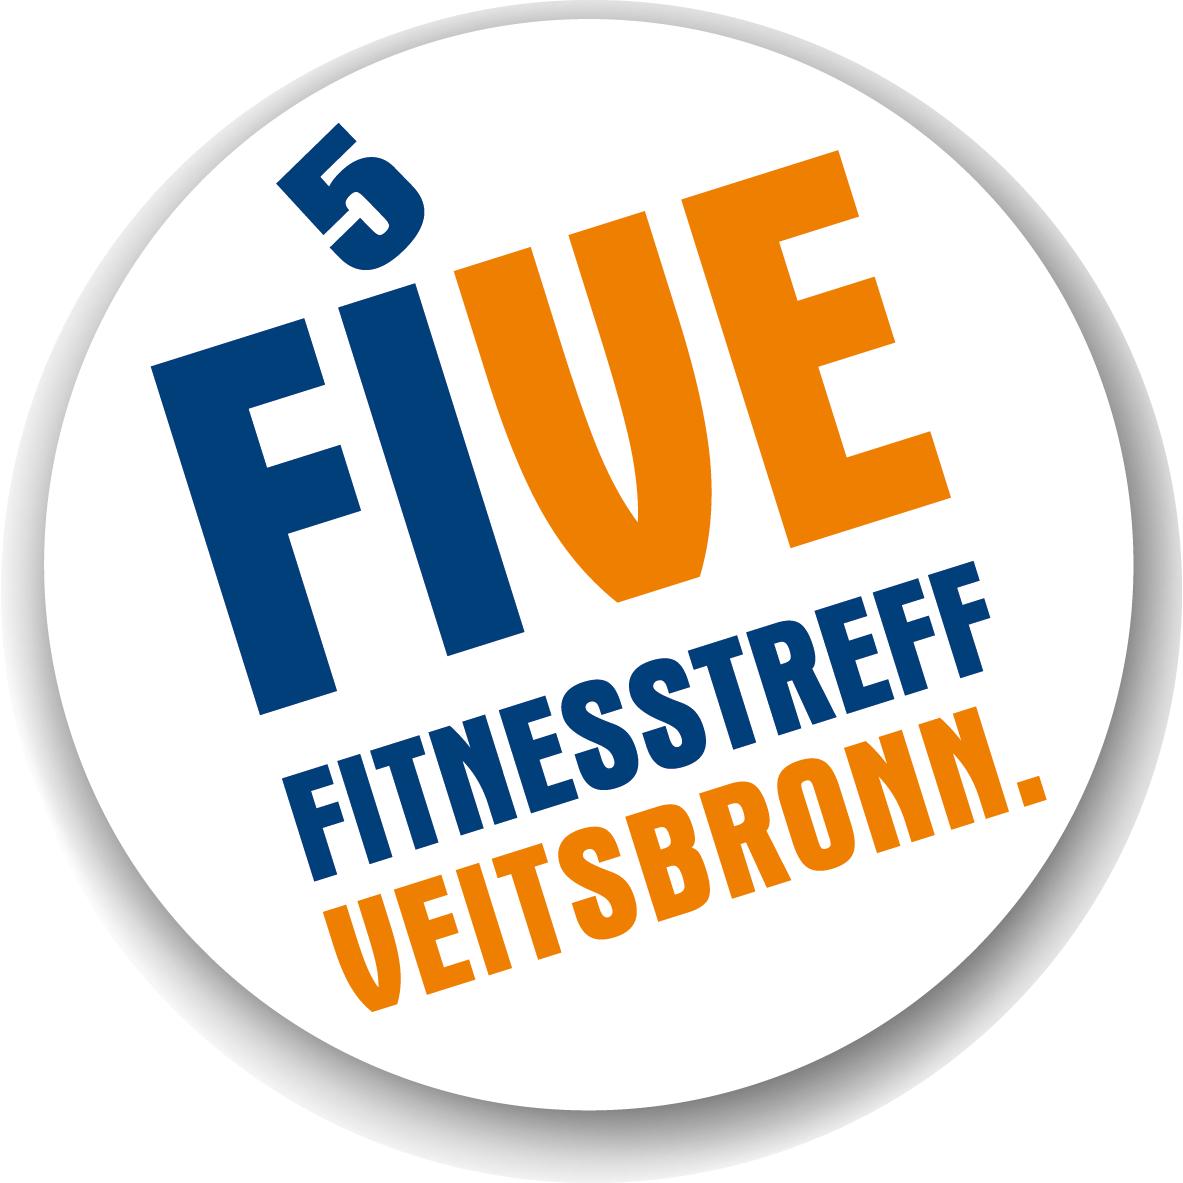 Bild zu FIVE Fitnesstreff Veitsbronn in Veitsbronn